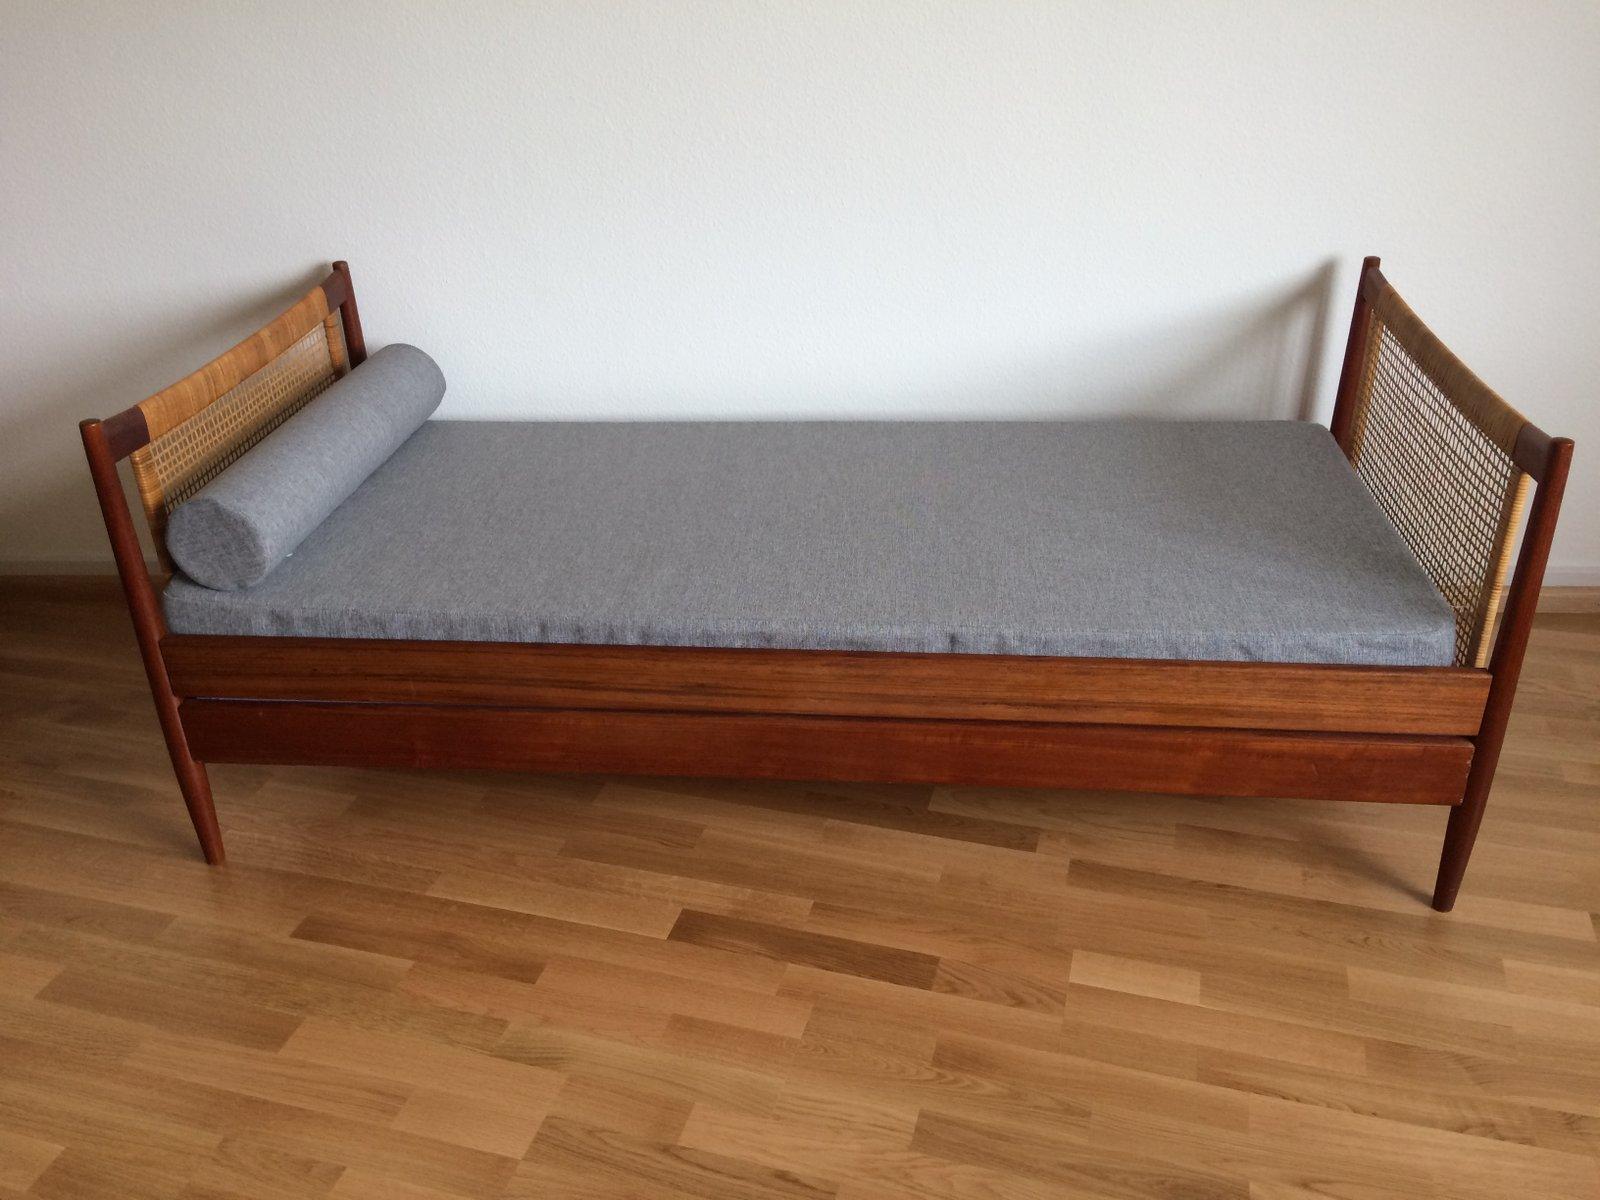 tagesbett von b rge mogensen f r s borg m bler 1960er bei. Black Bedroom Furniture Sets. Home Design Ideas